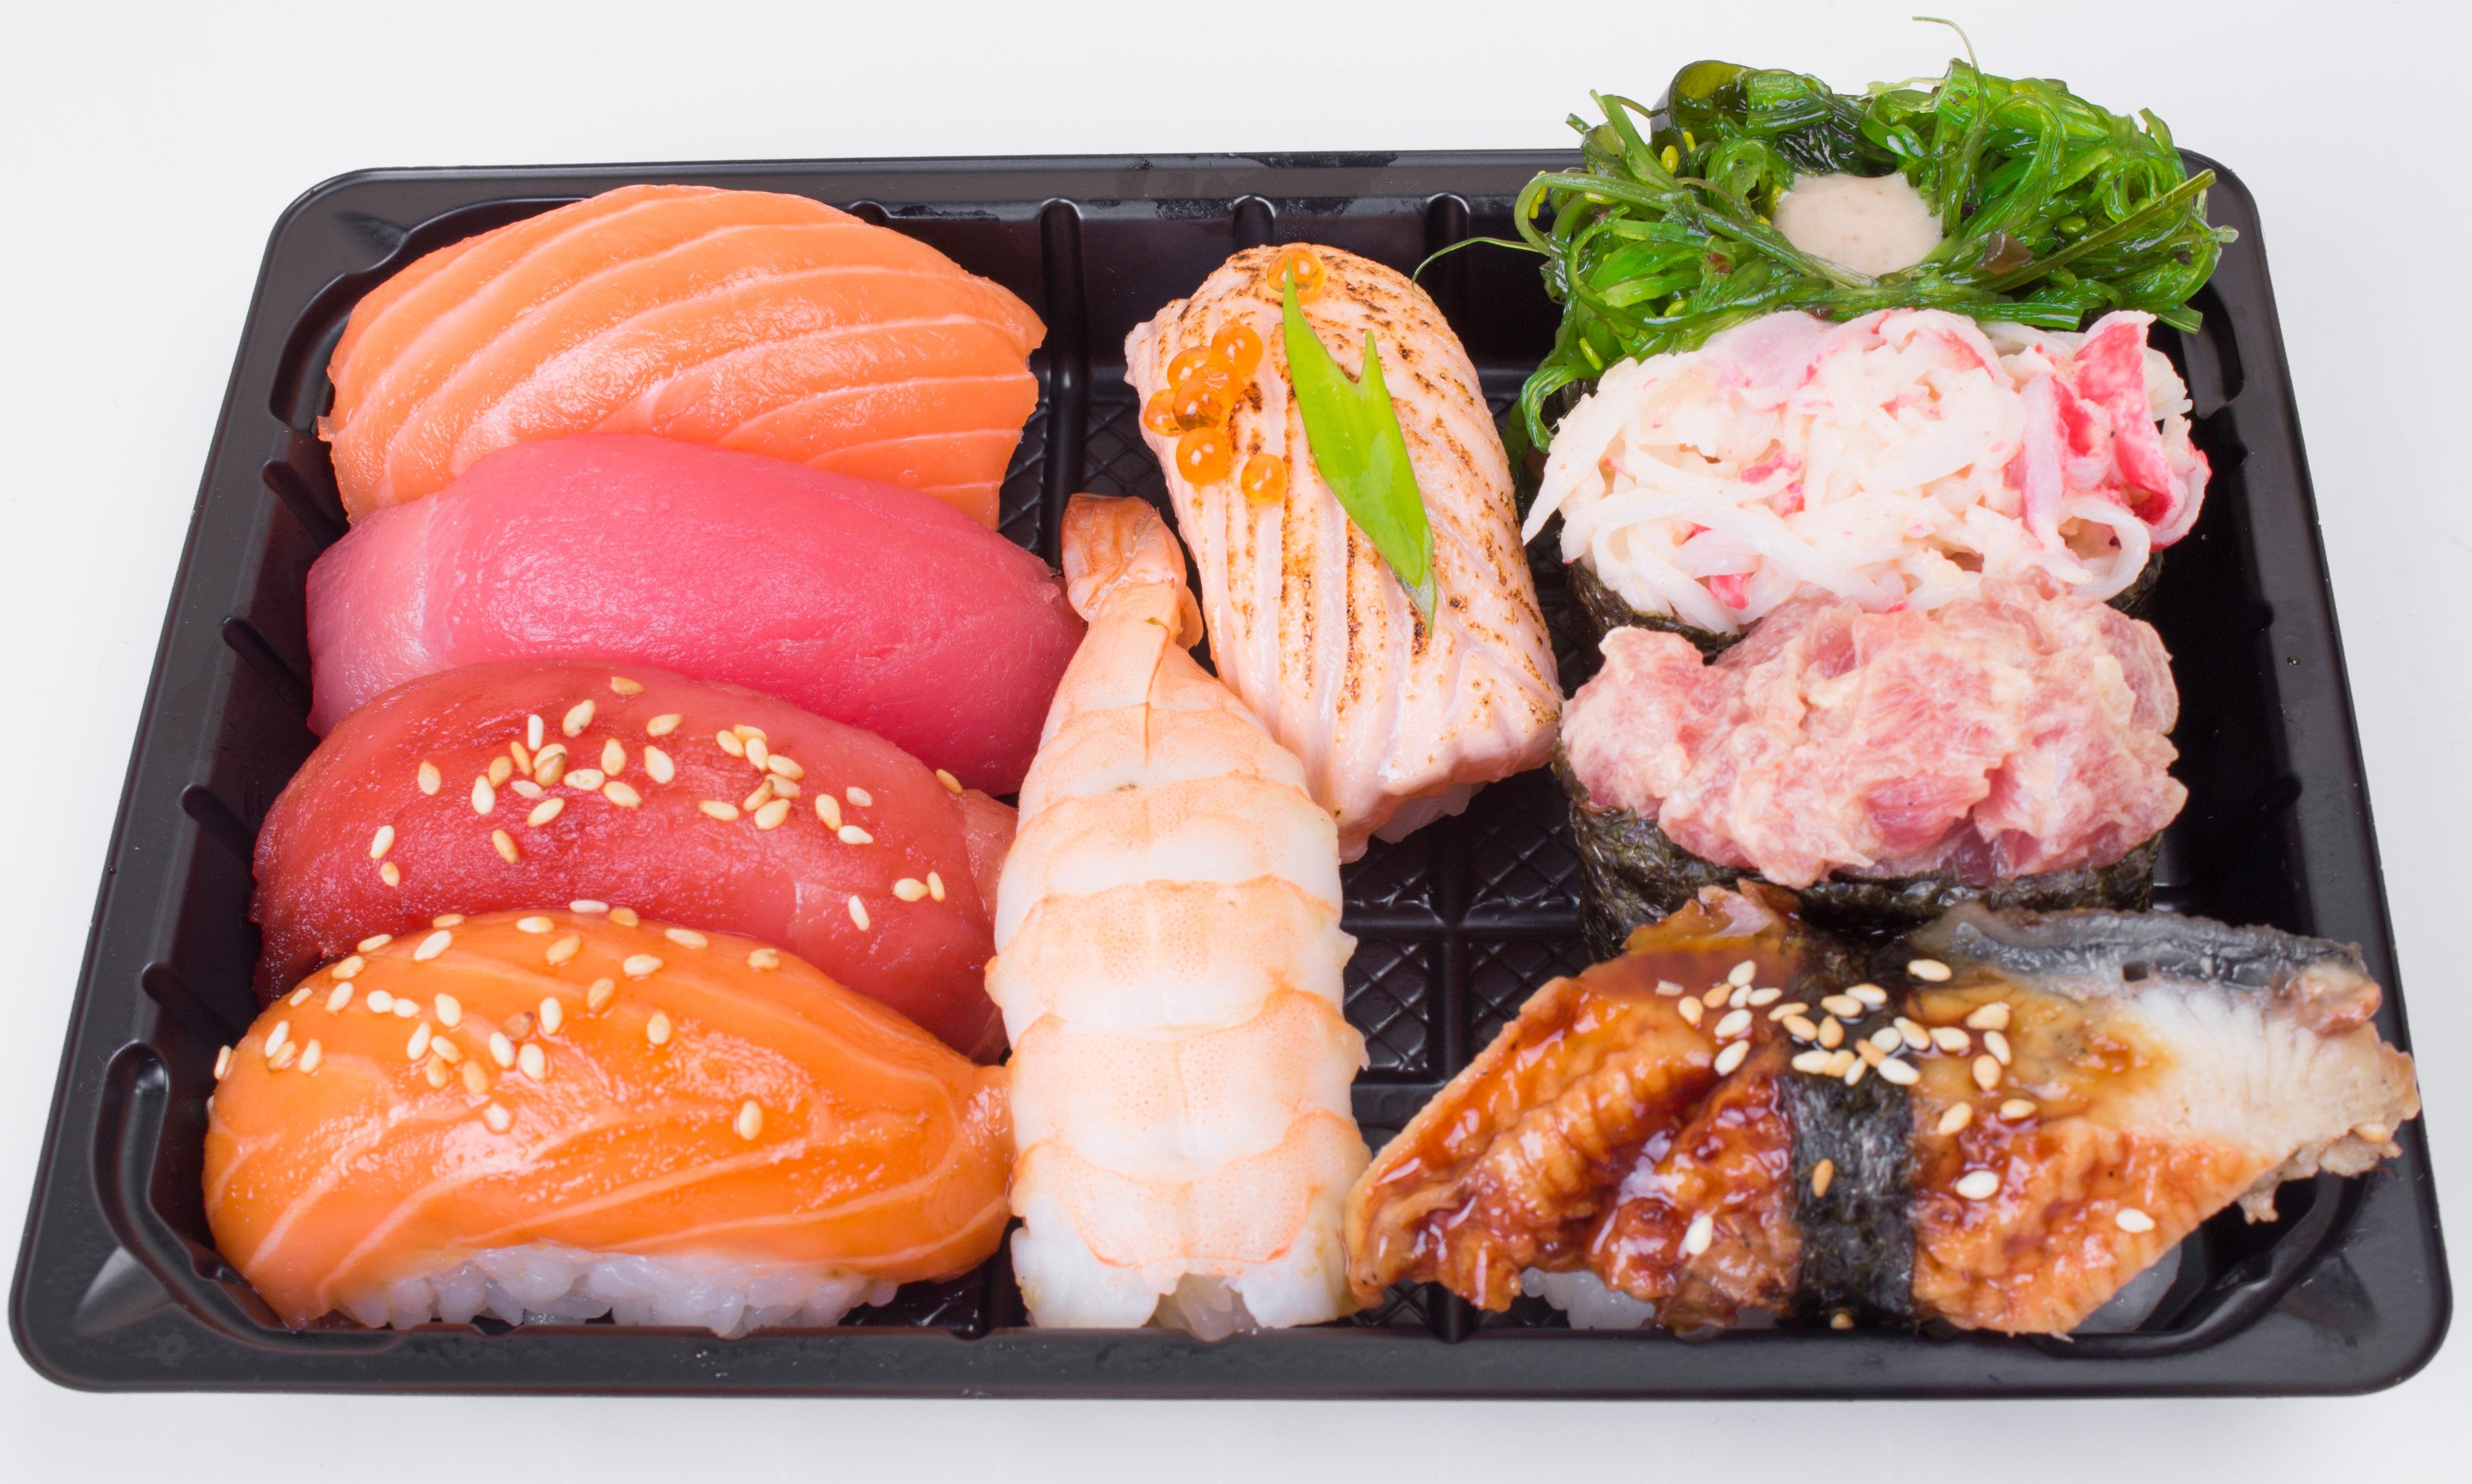 Fotos gratis : plato, pescado, Japón, comida asiática, Sushi ...